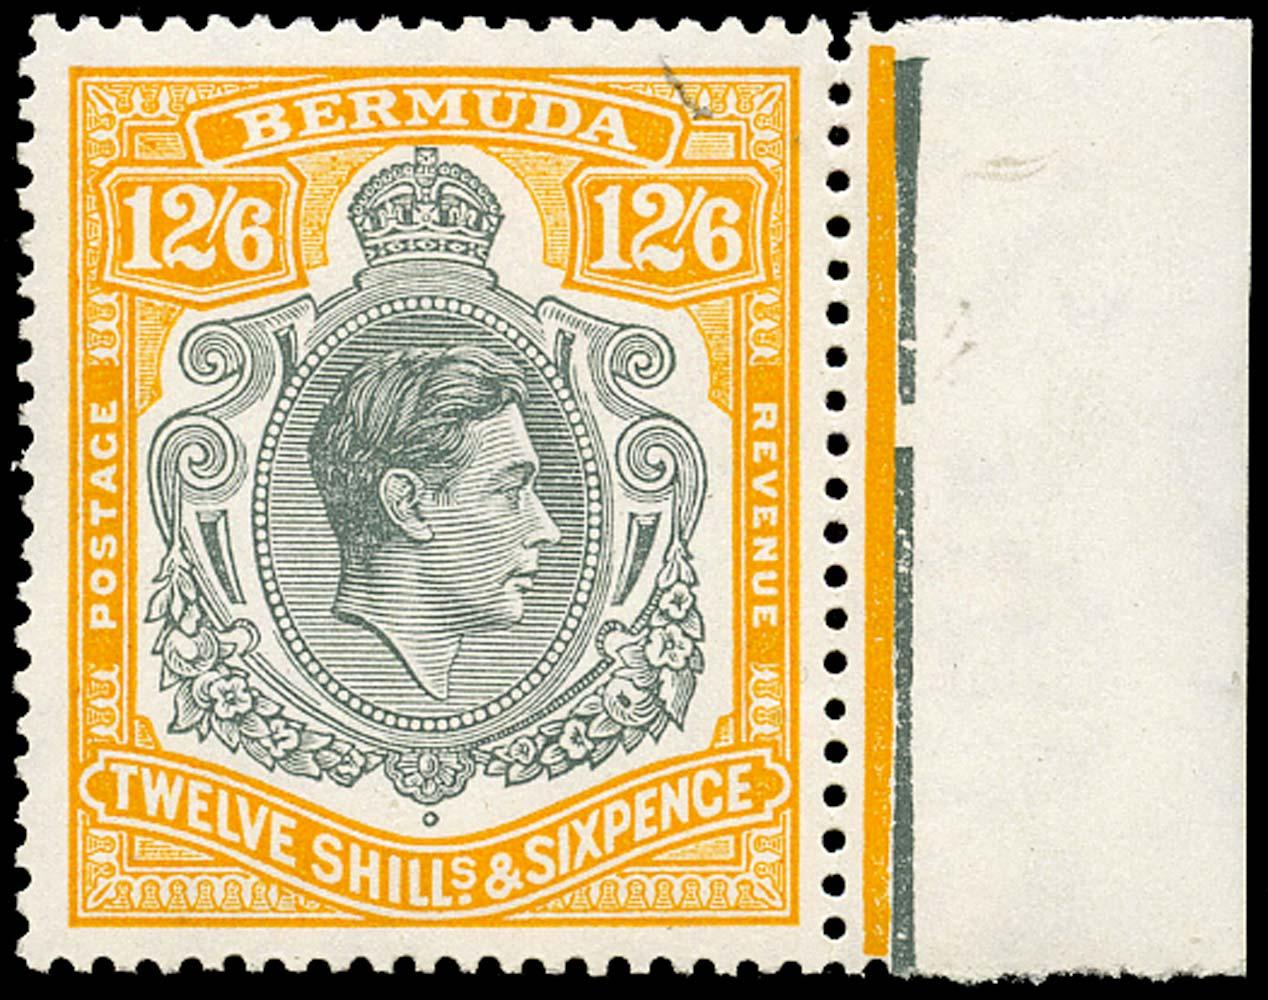 BERMUDA 1950  SG120e Mint 12s6d grey and pale orange perf 13